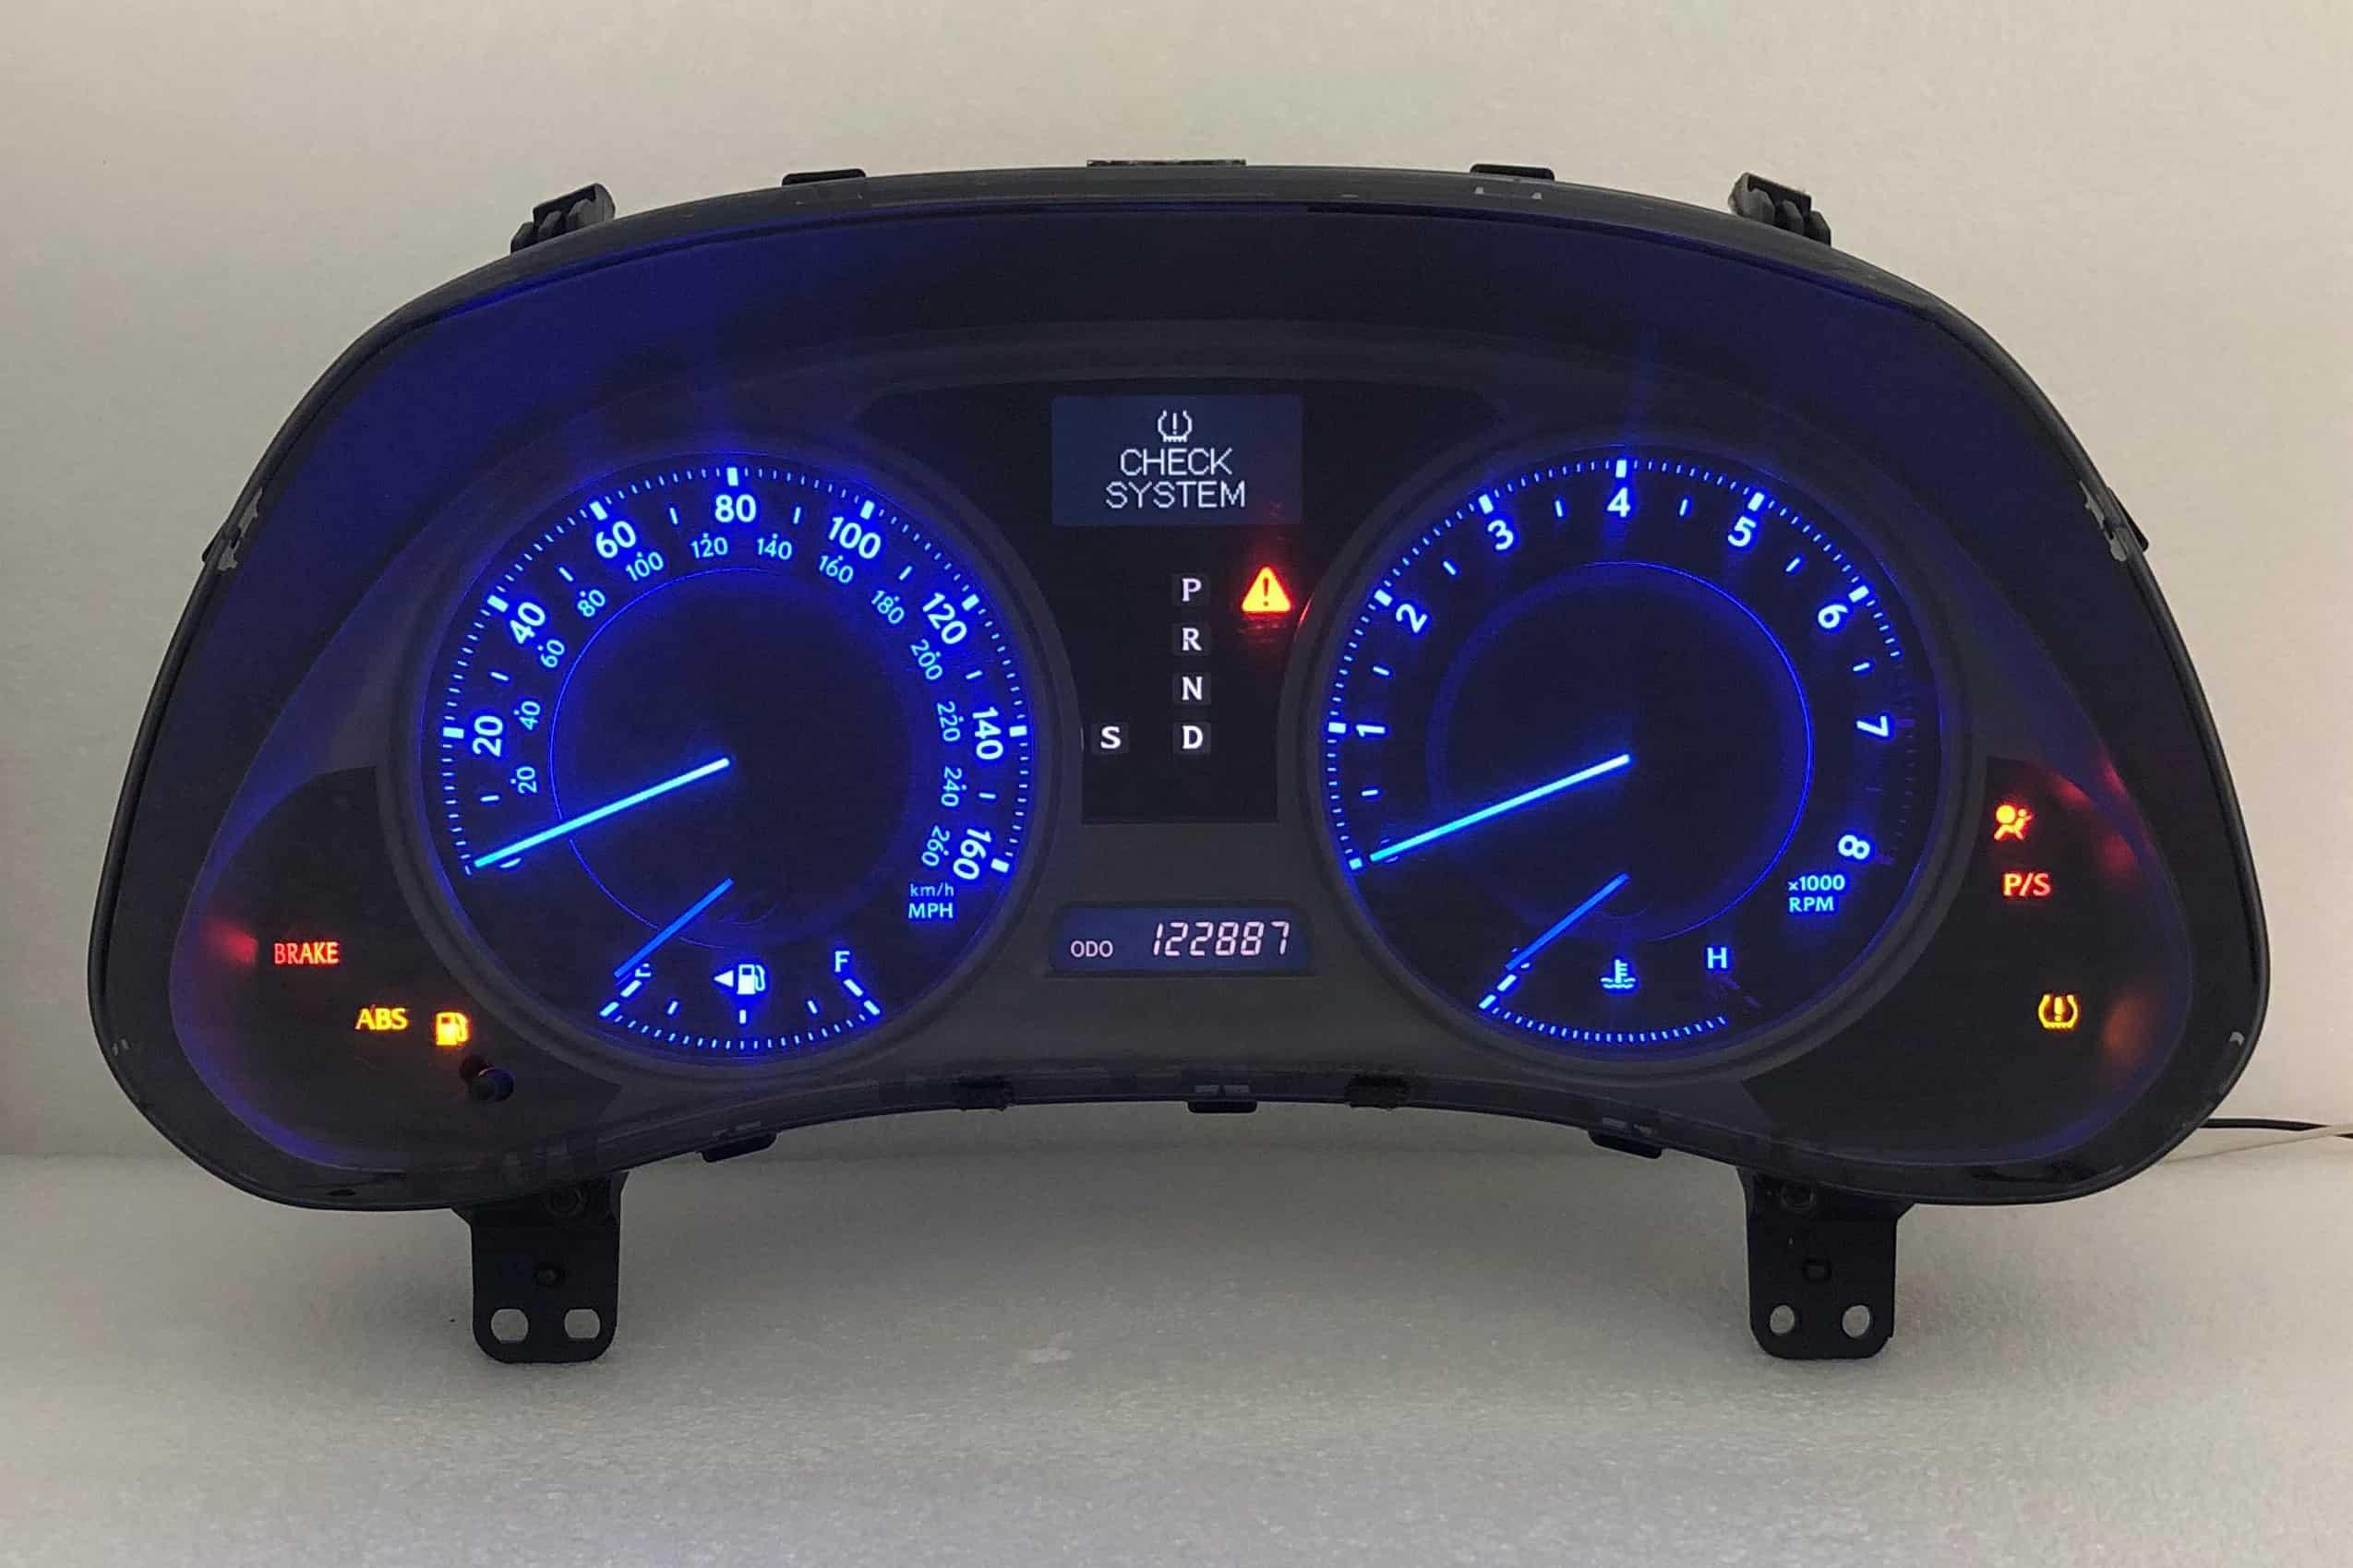 2006 - 2013 Lexus IS-F, IS250, IS350 Instrument Cluster Repair